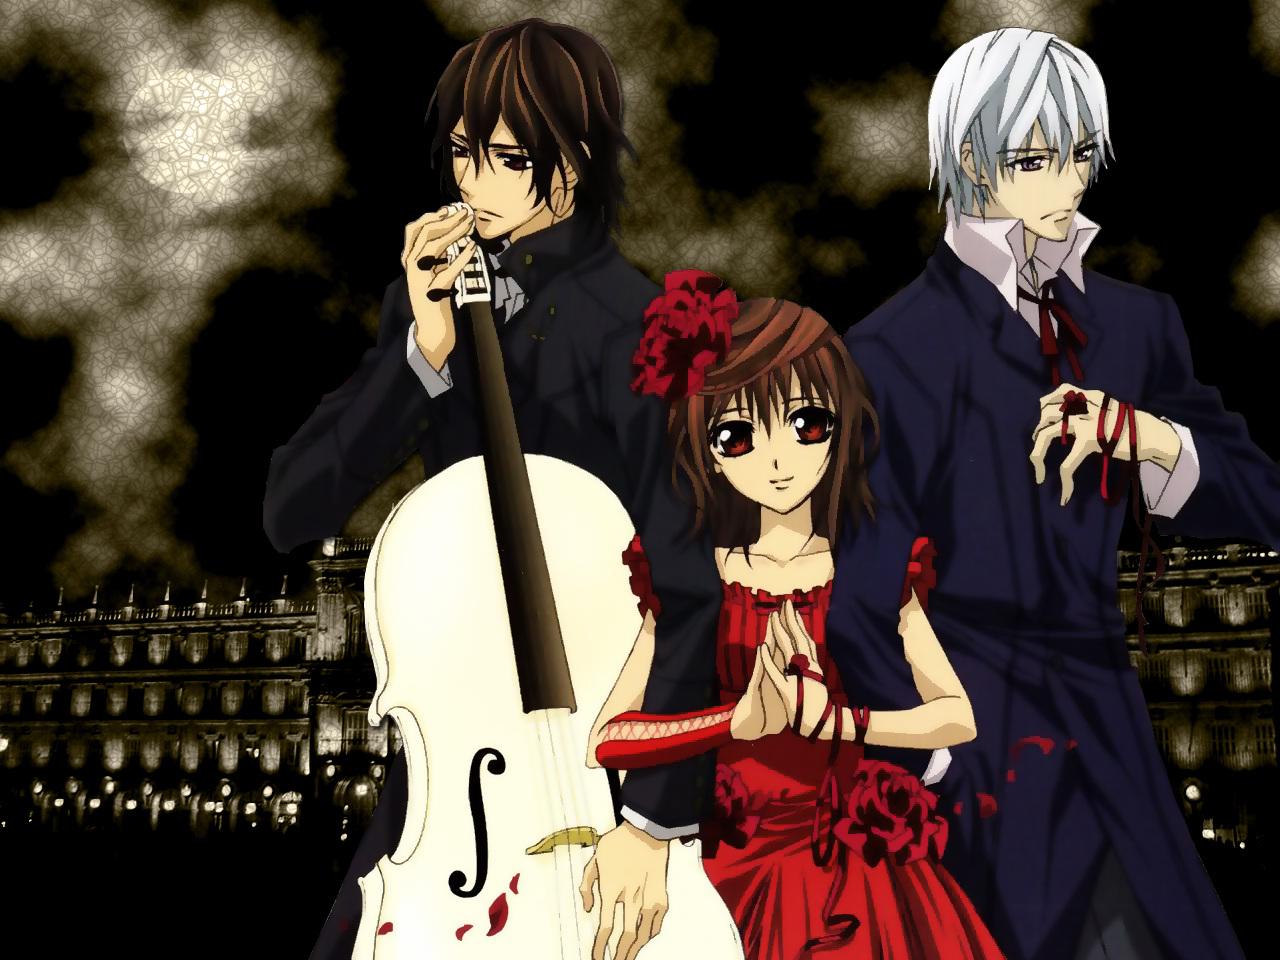 Vampire knight wallpaper 2 by takeshikun2008 on deviantart - Vampire knight anime wallpaper ...